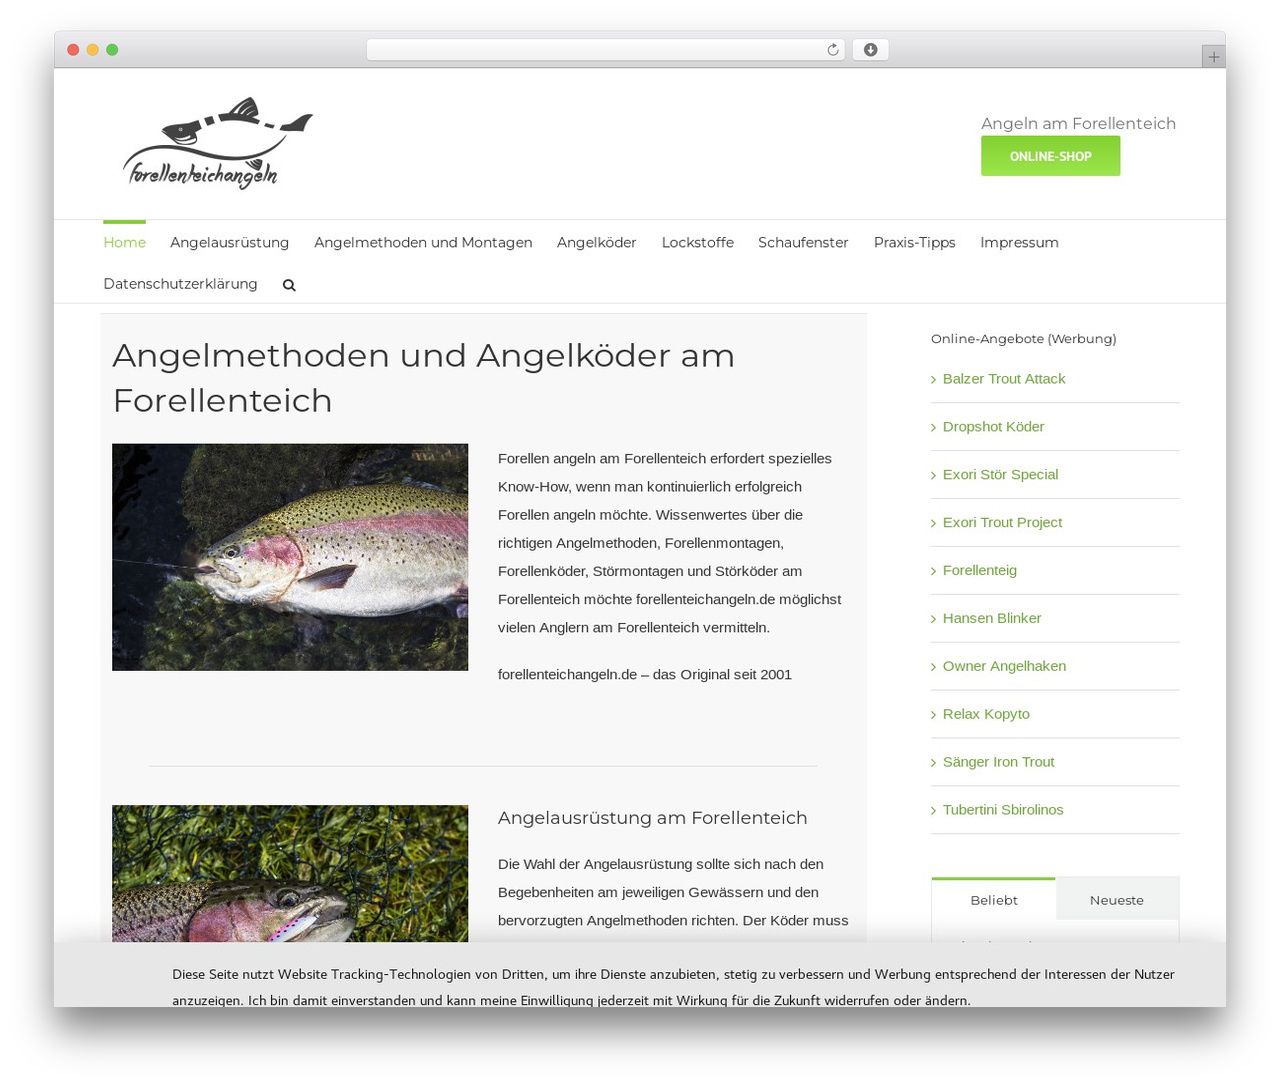 WP theme Avada - forellenteichangeln.de